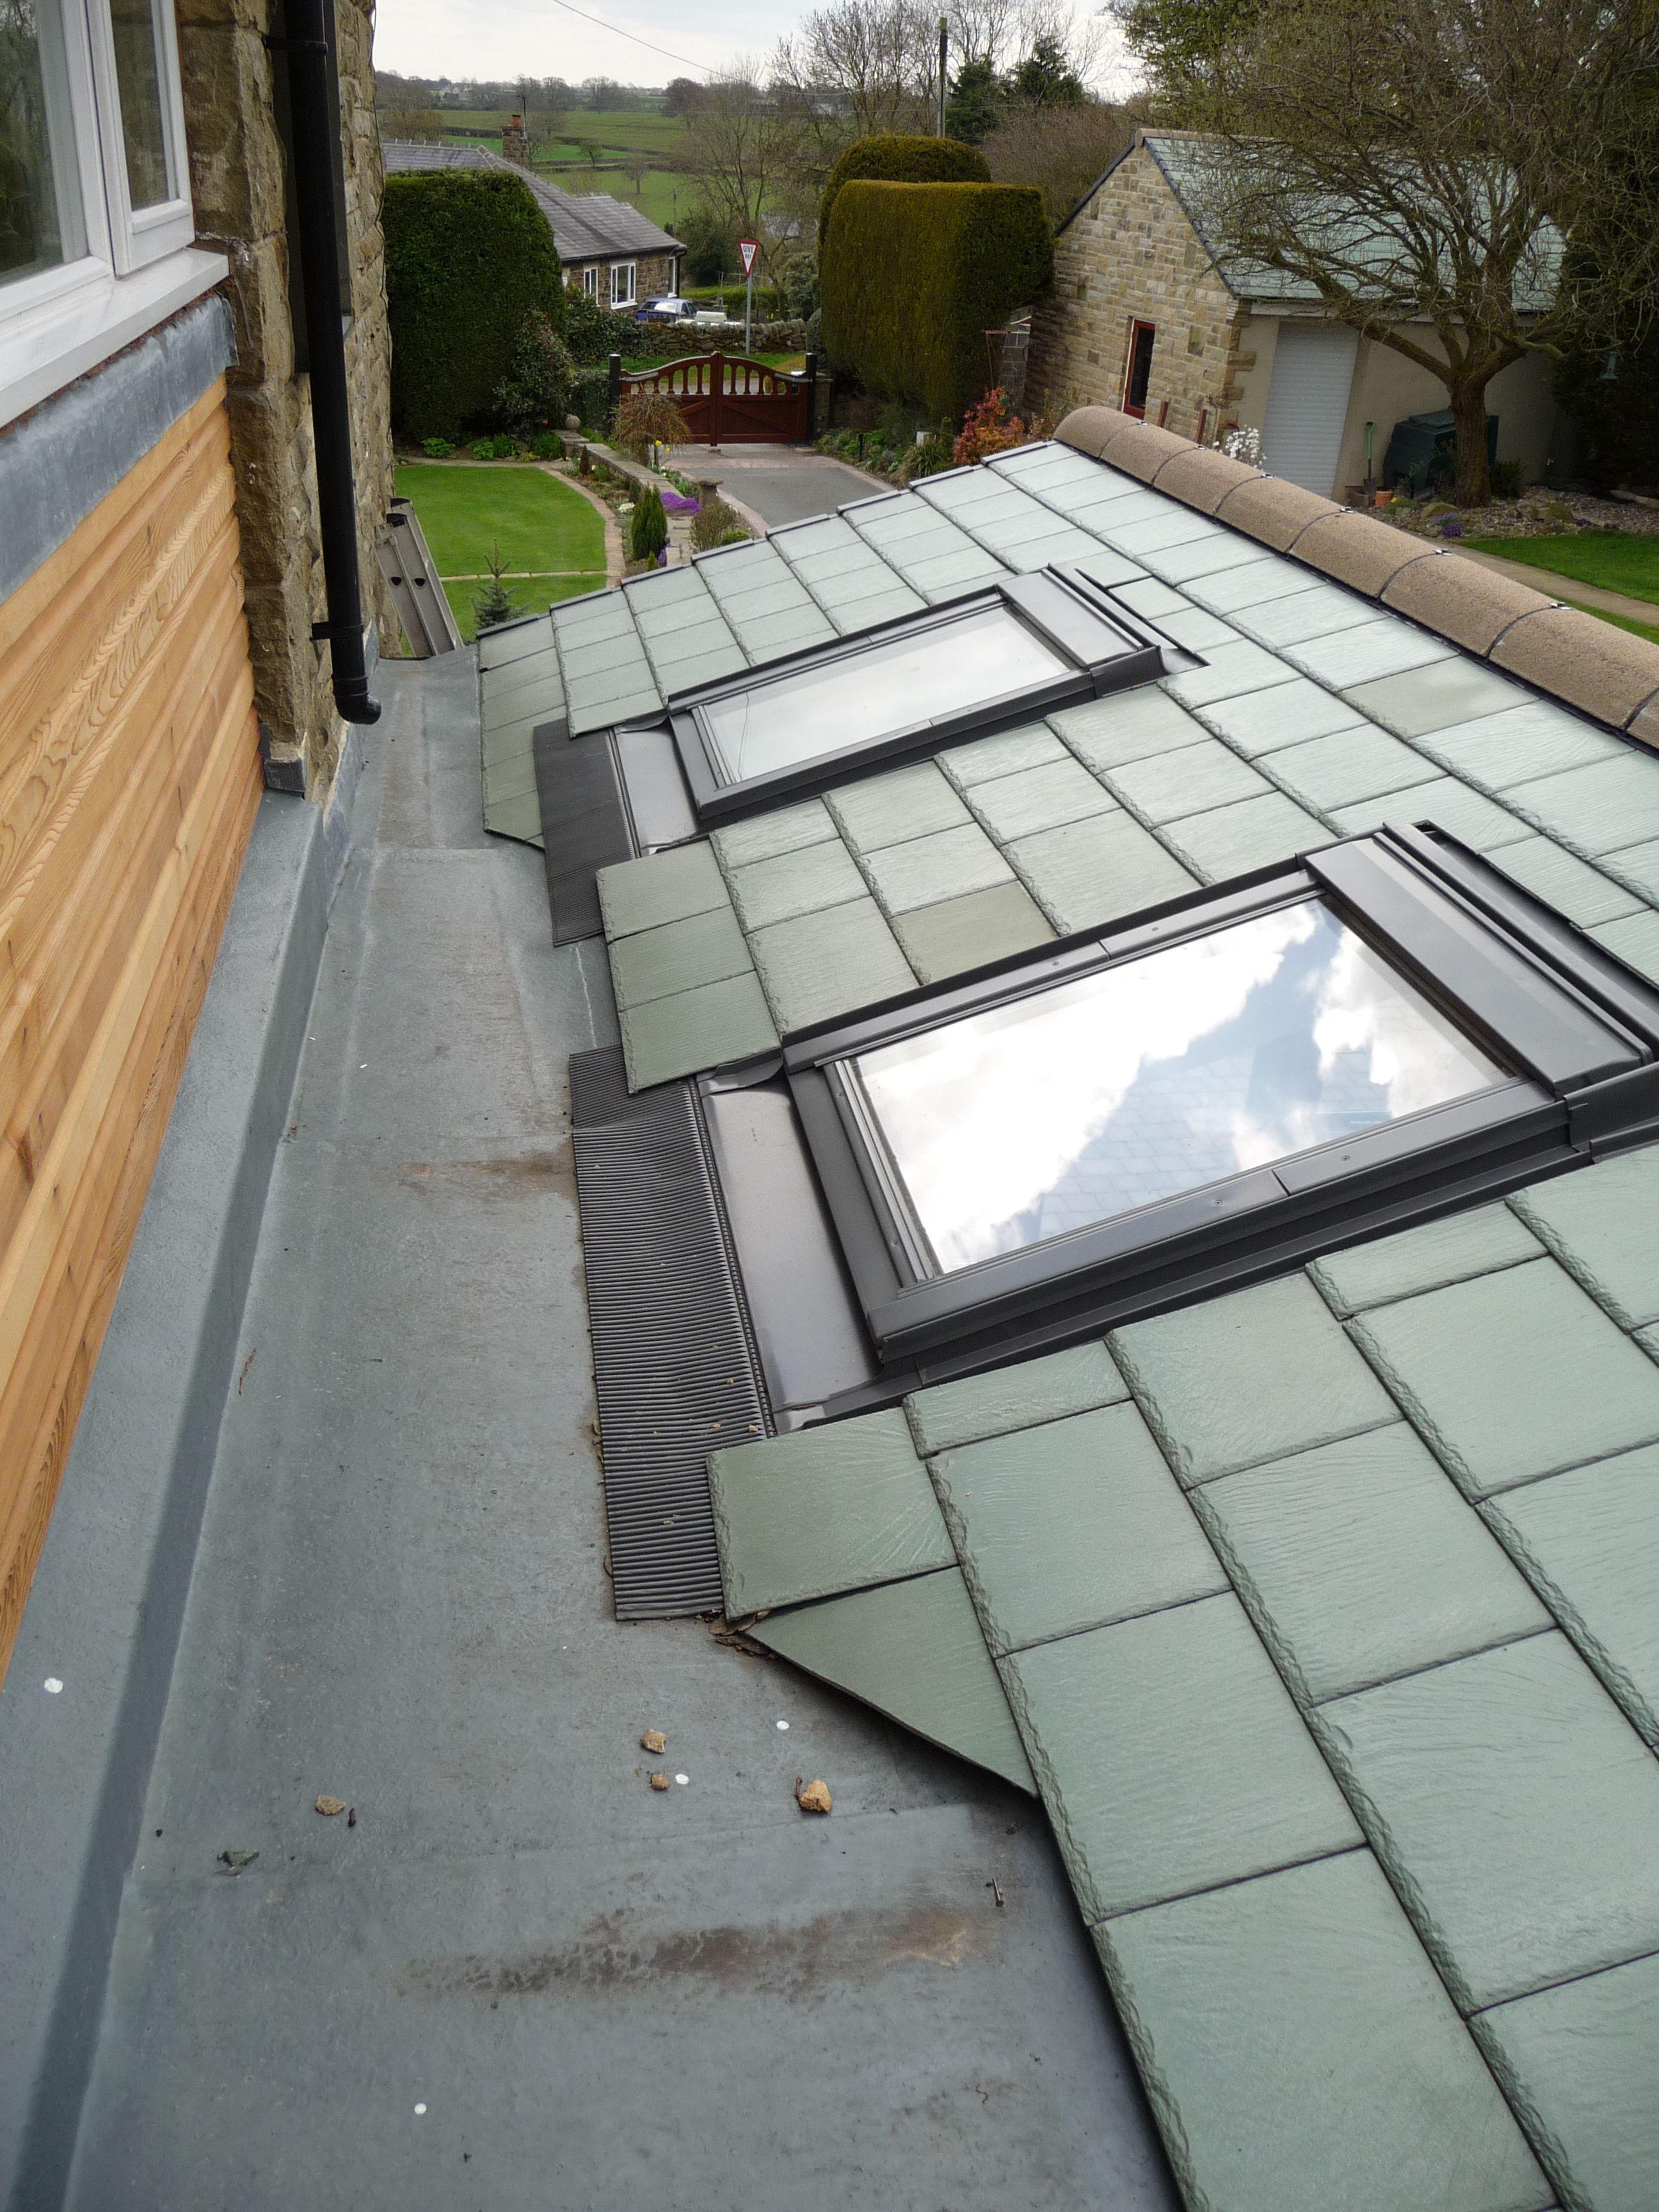 GRP secret gutter with green slate roof by Derry Construction Ltd. 2012